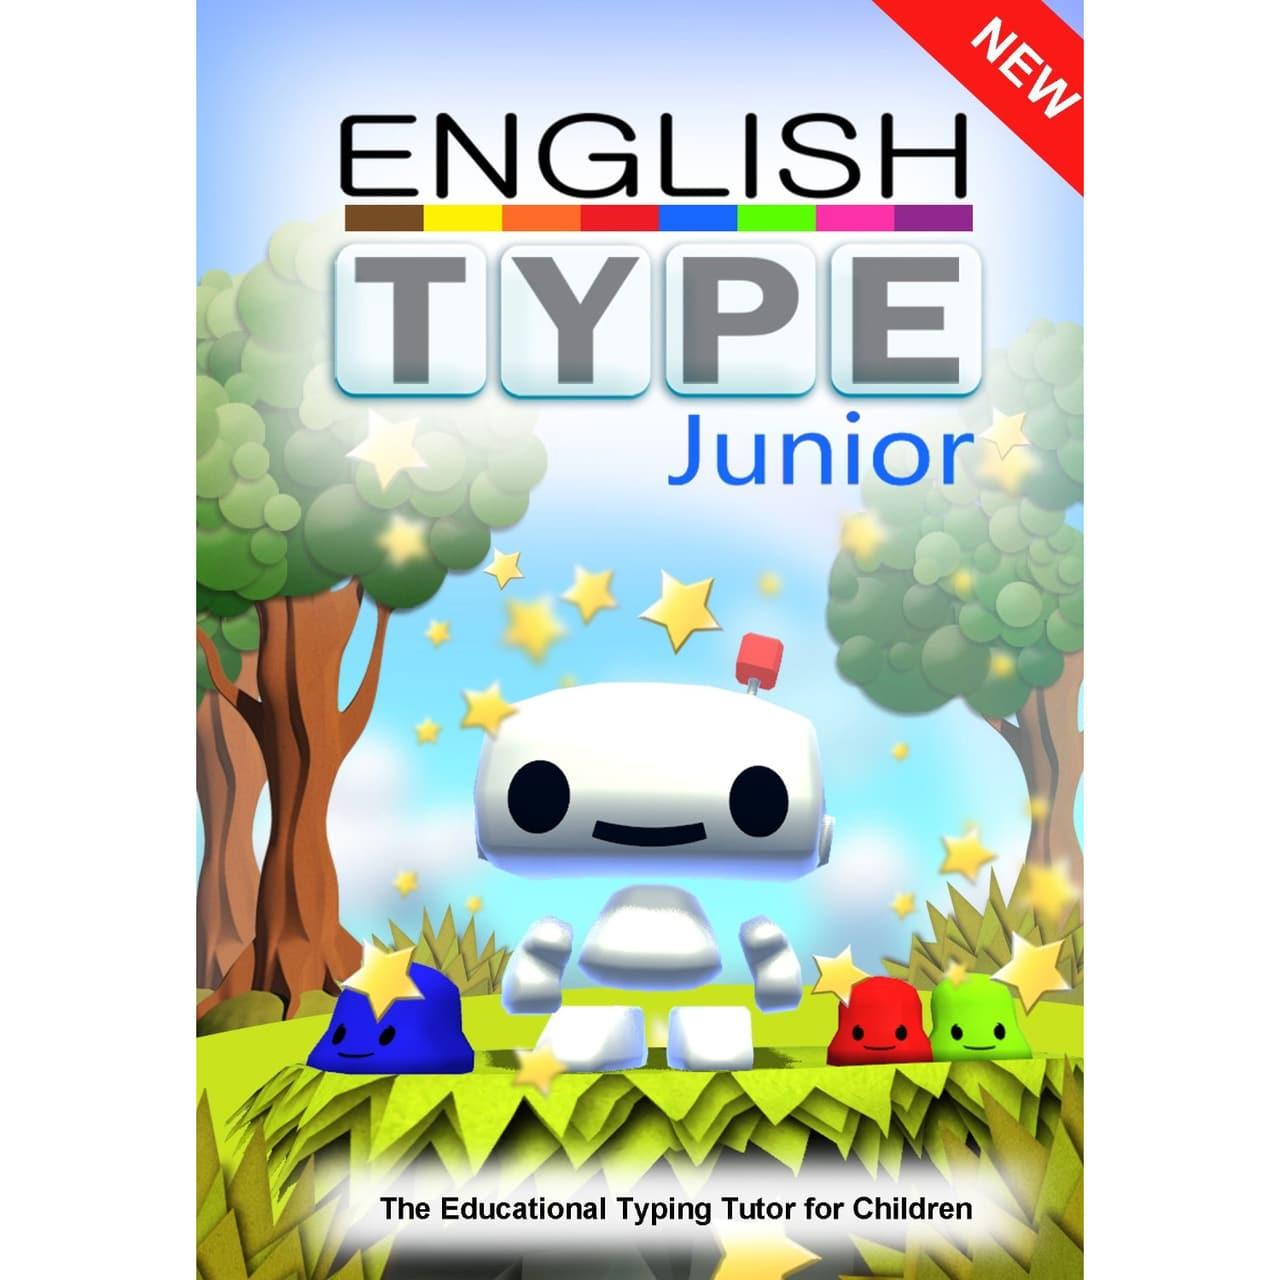 Englishtype Junior Typing Tutor - Mac (Digital Download available)